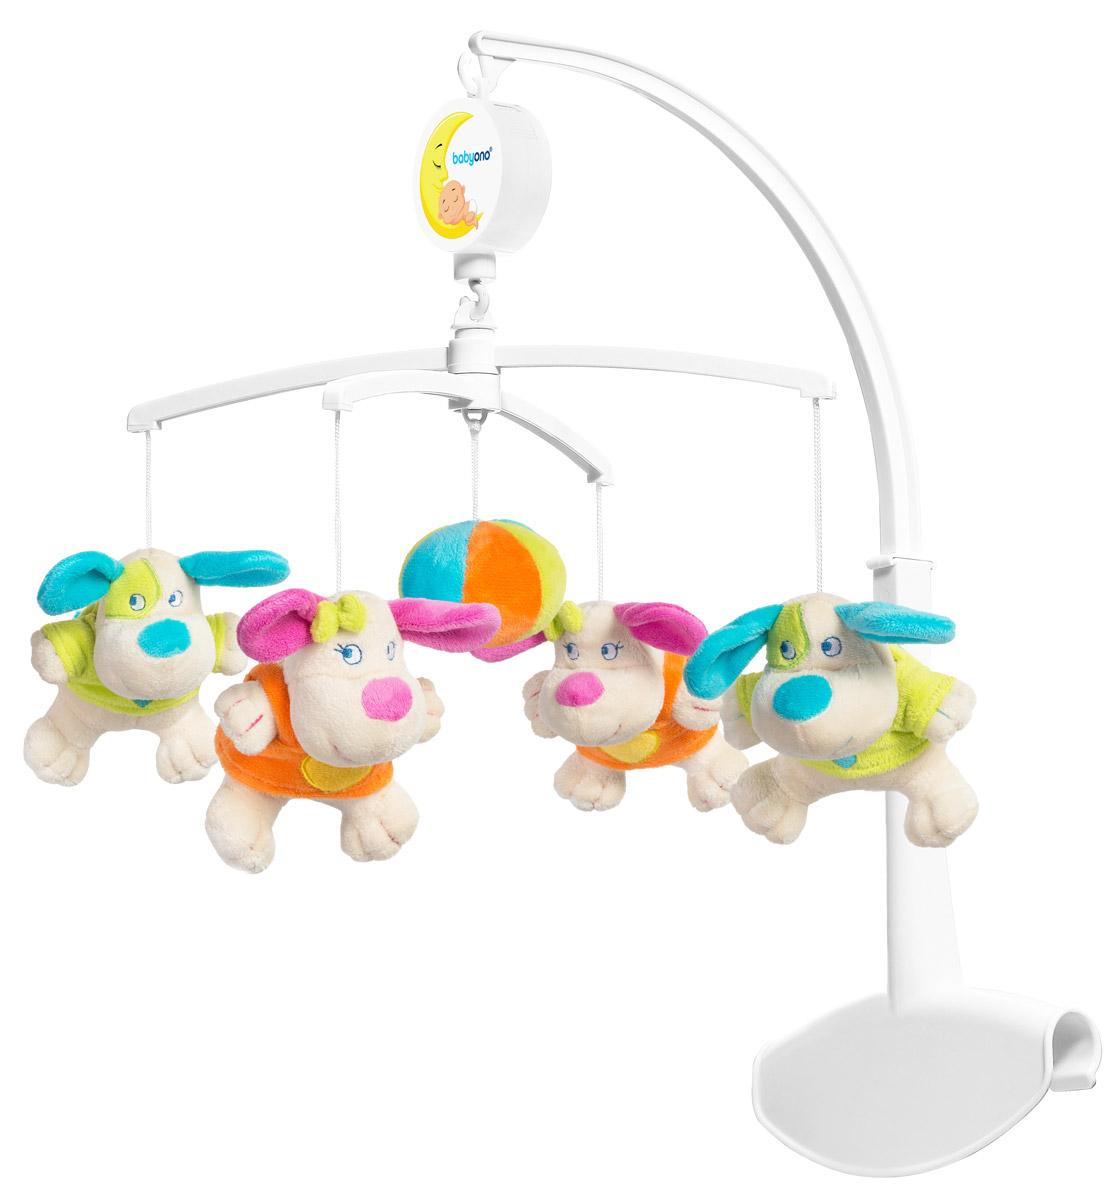 BabyOno Музыкальная карусель Команда собачек - Игрушки для малышей